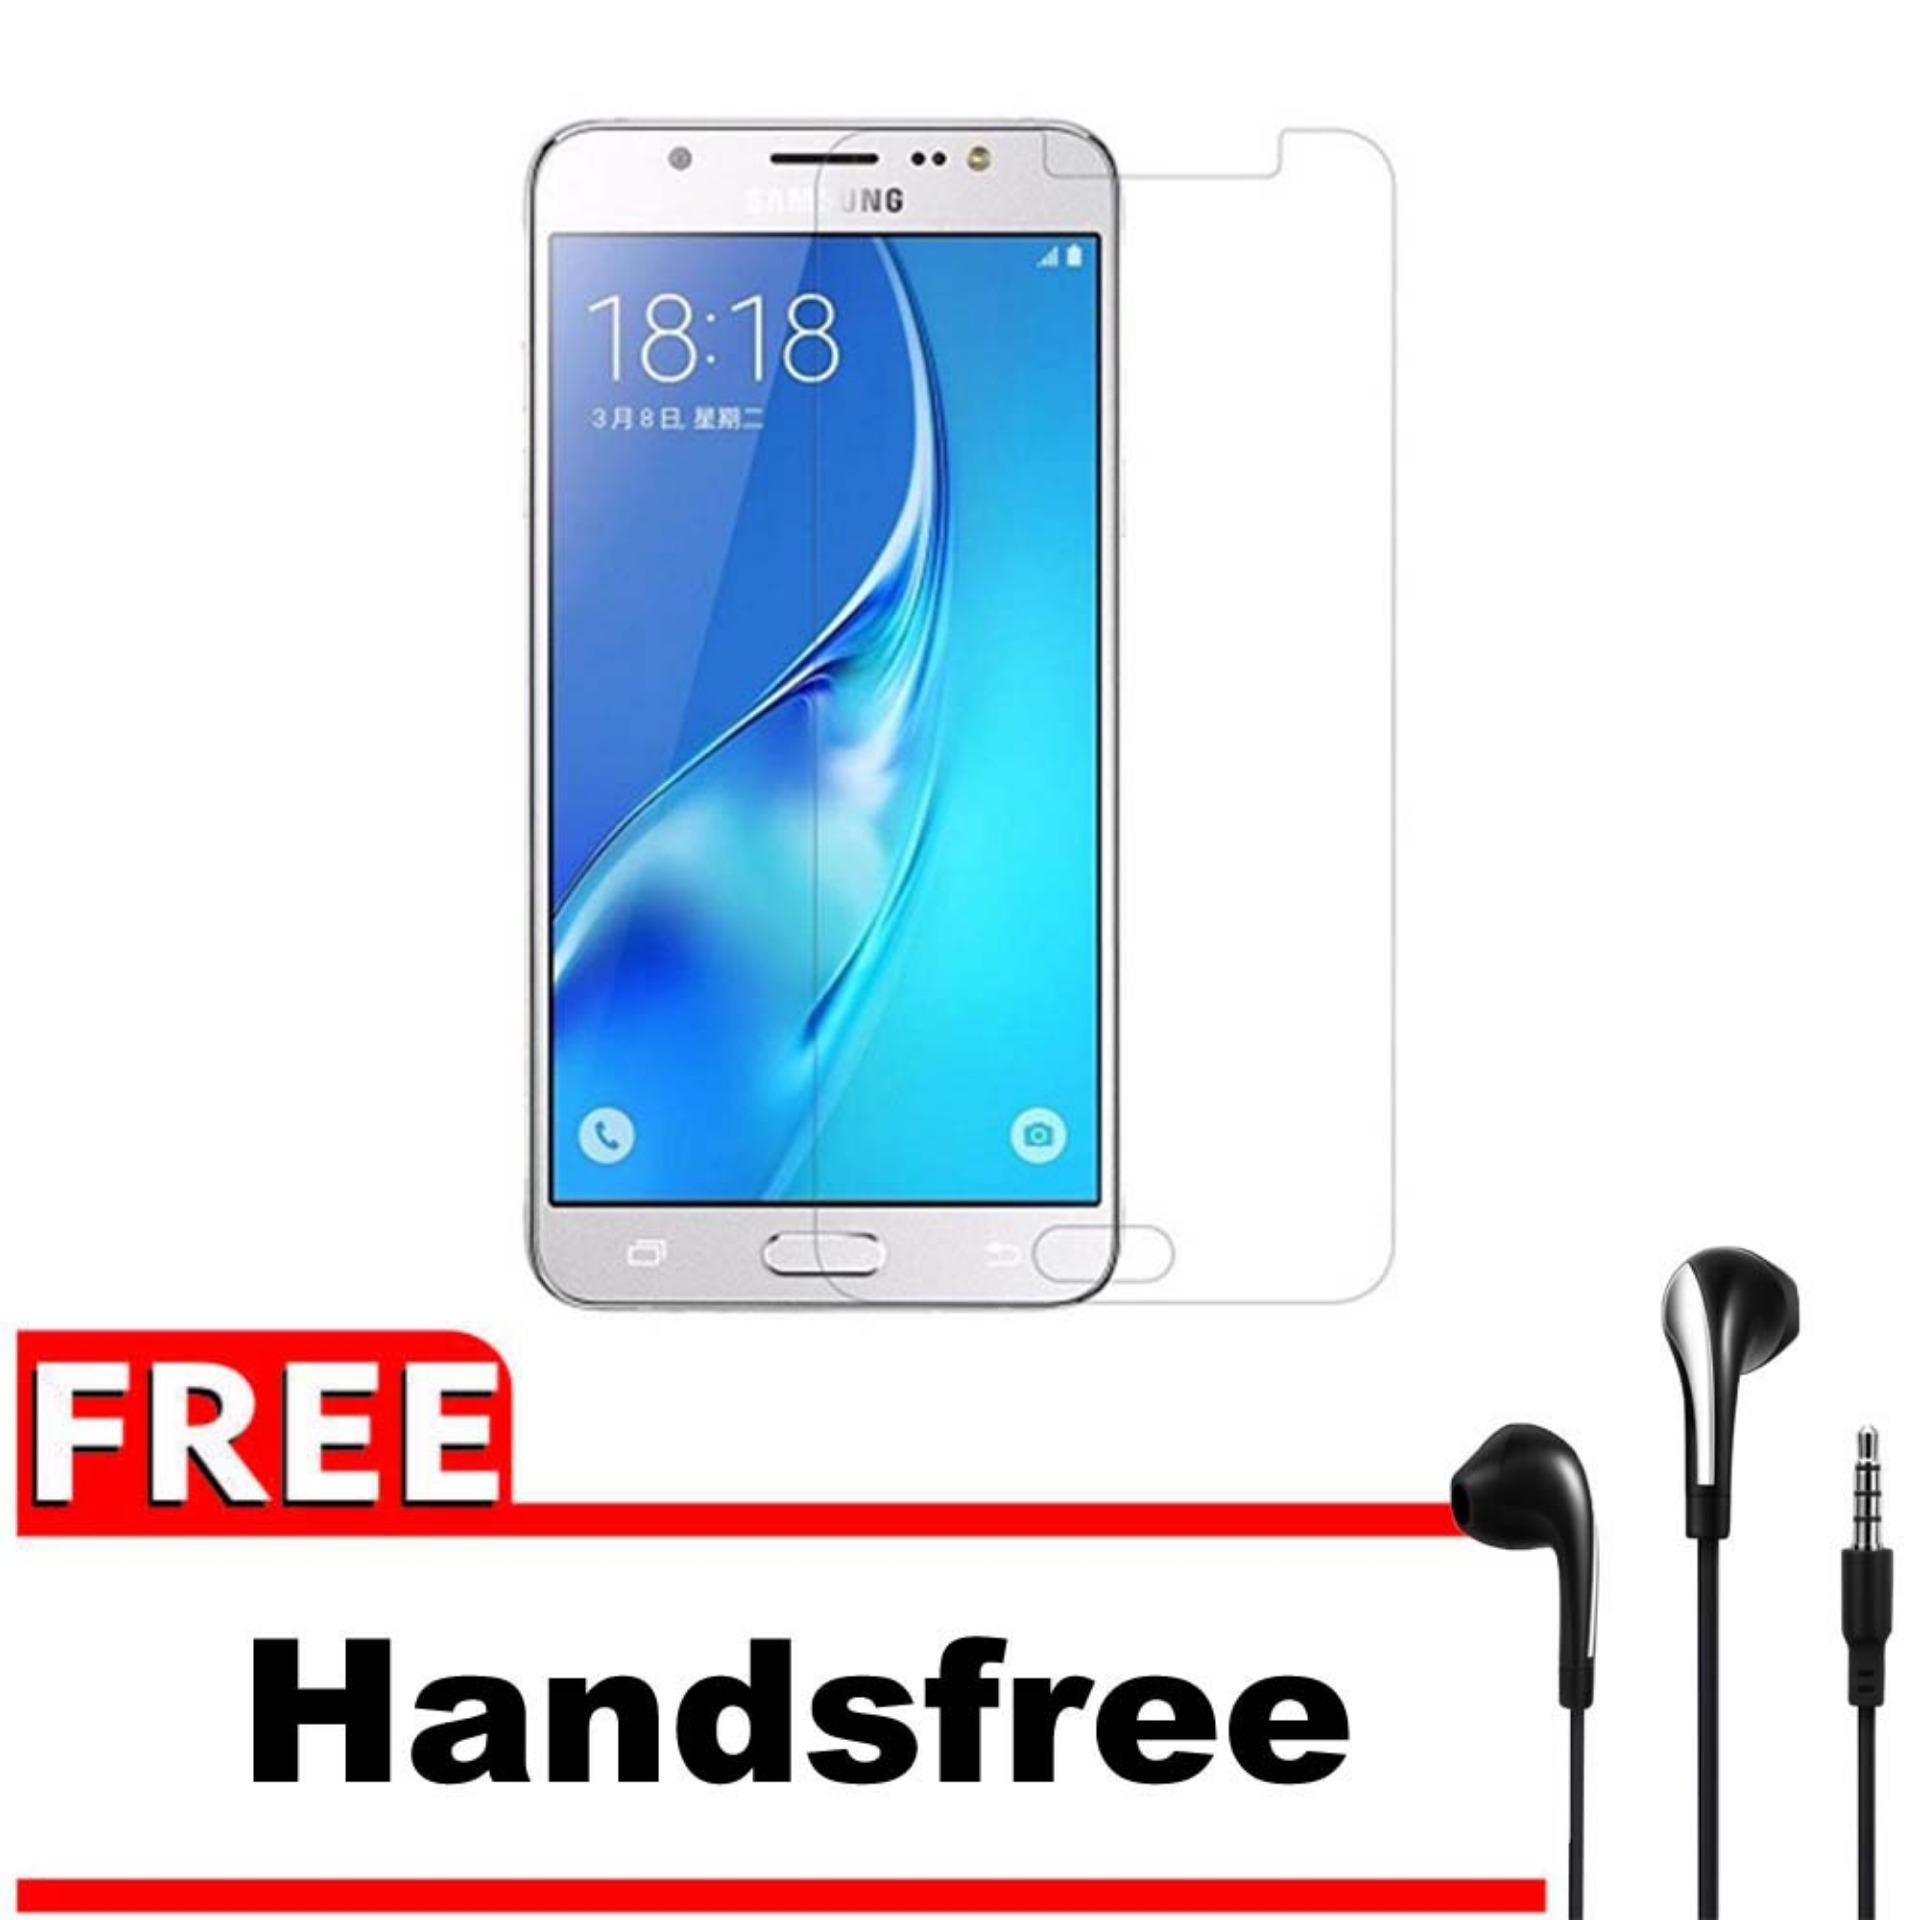 Vn Samsung Galaxy ON 7 / ON7 (2015) / Pro / G600 / G600FY / G600S/ 4G LTE / Duos Tempered Glass 9H Screen Protector 0.32mm + Gratis Free Handsfree Earphone Headset Universal - Bening Transparan